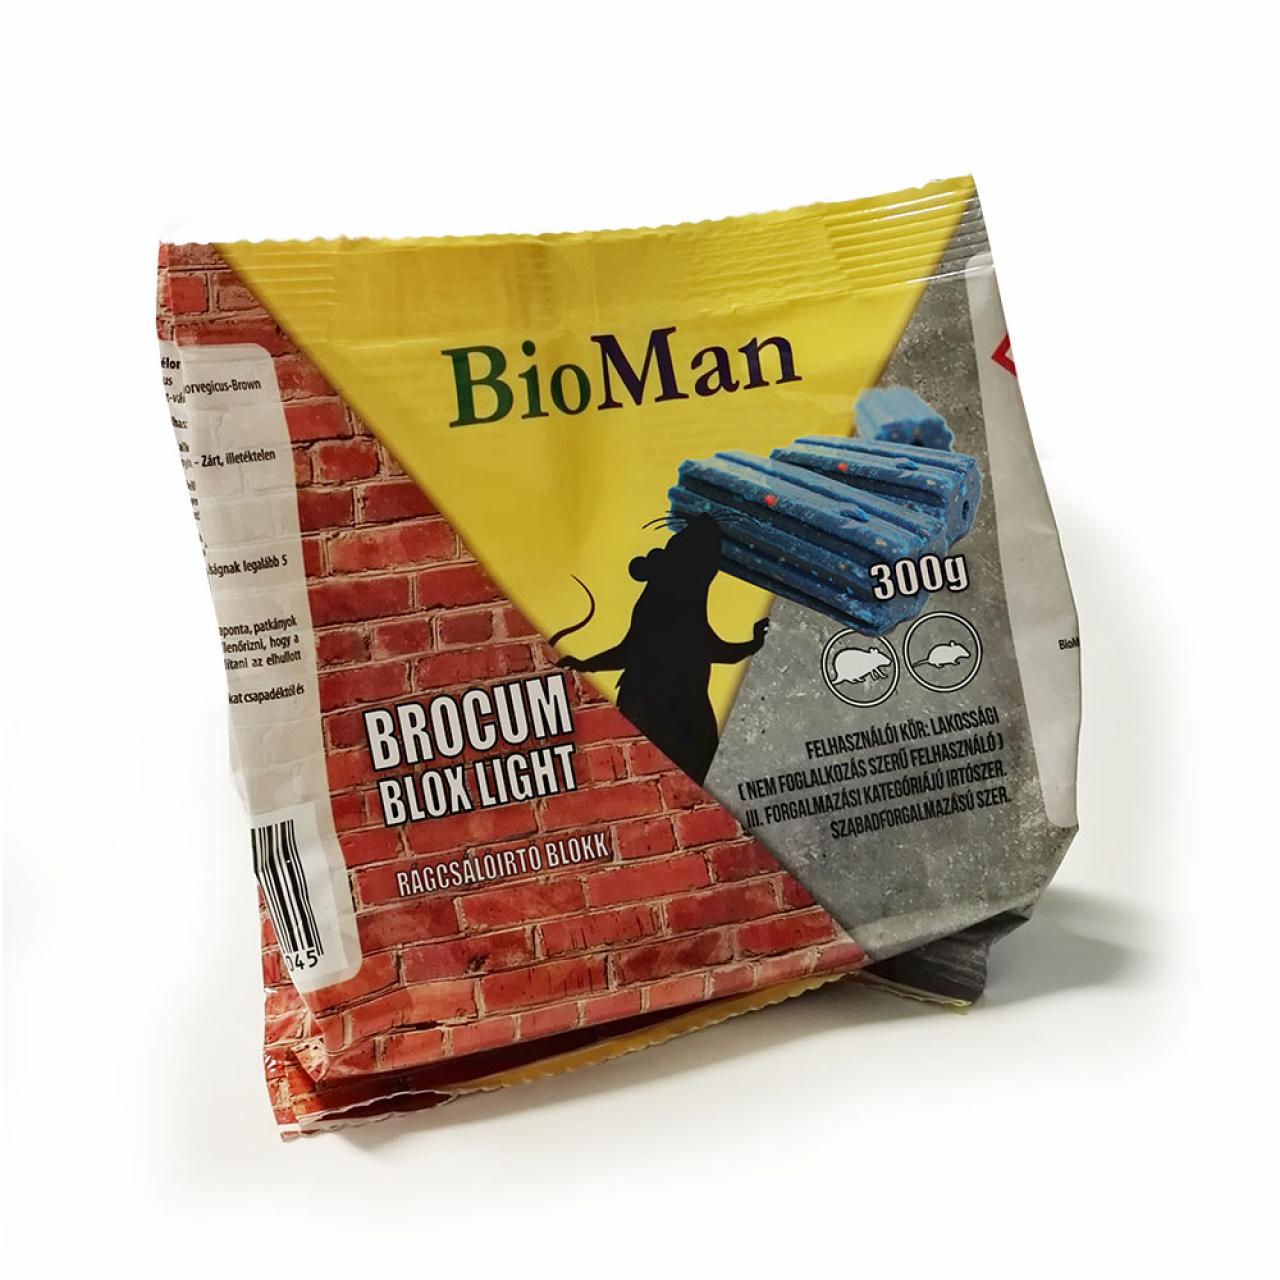 Brocum Blox light, rágcsálóírtó blokk, 25ppm 300 g